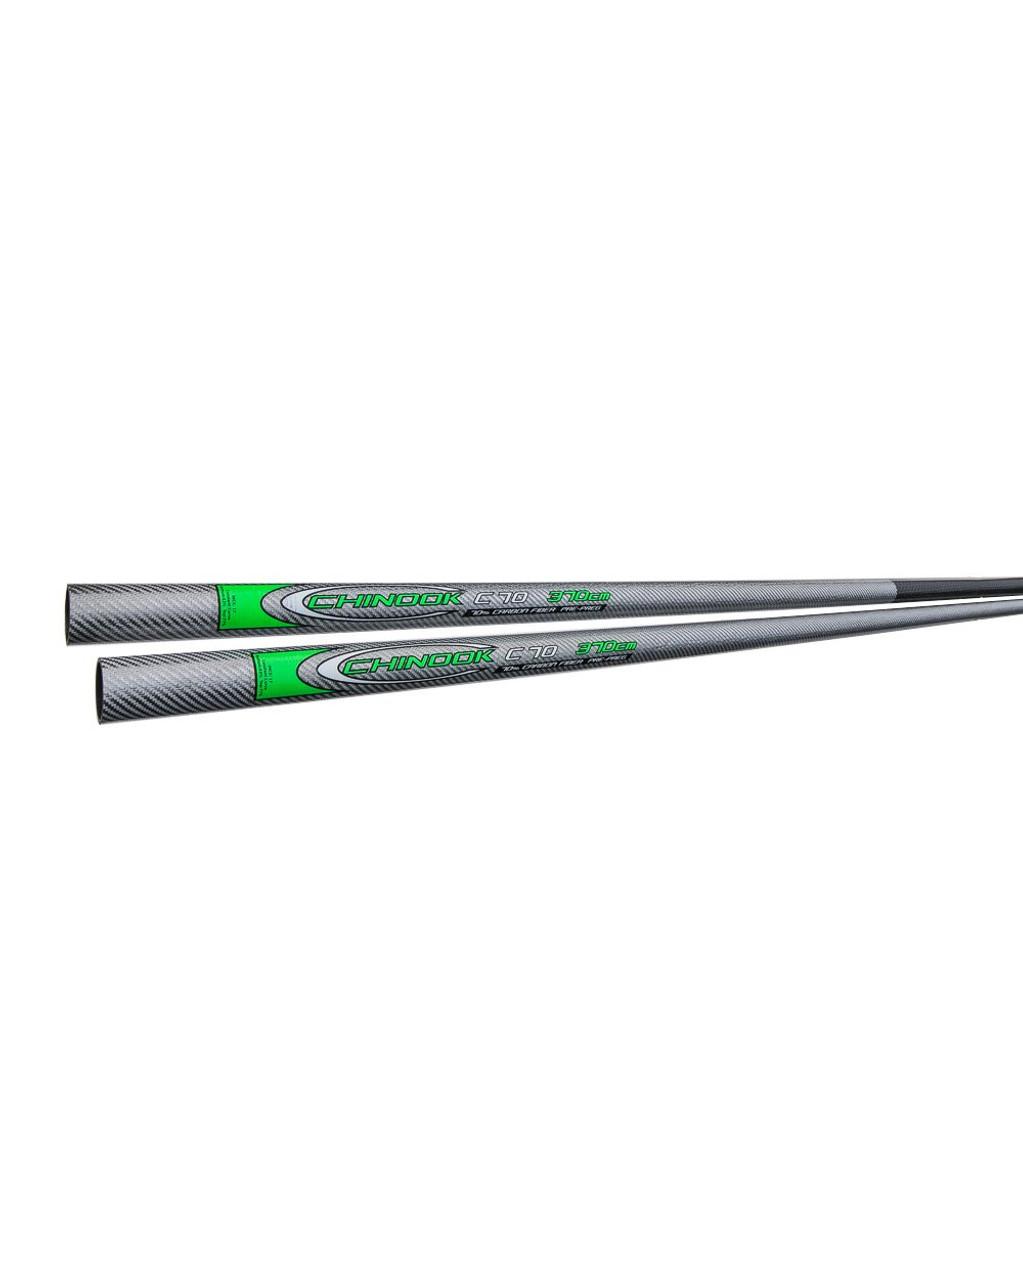 2019 70T Carbon Fiber 2-Piece RDM Mast with full Texalium Wrap